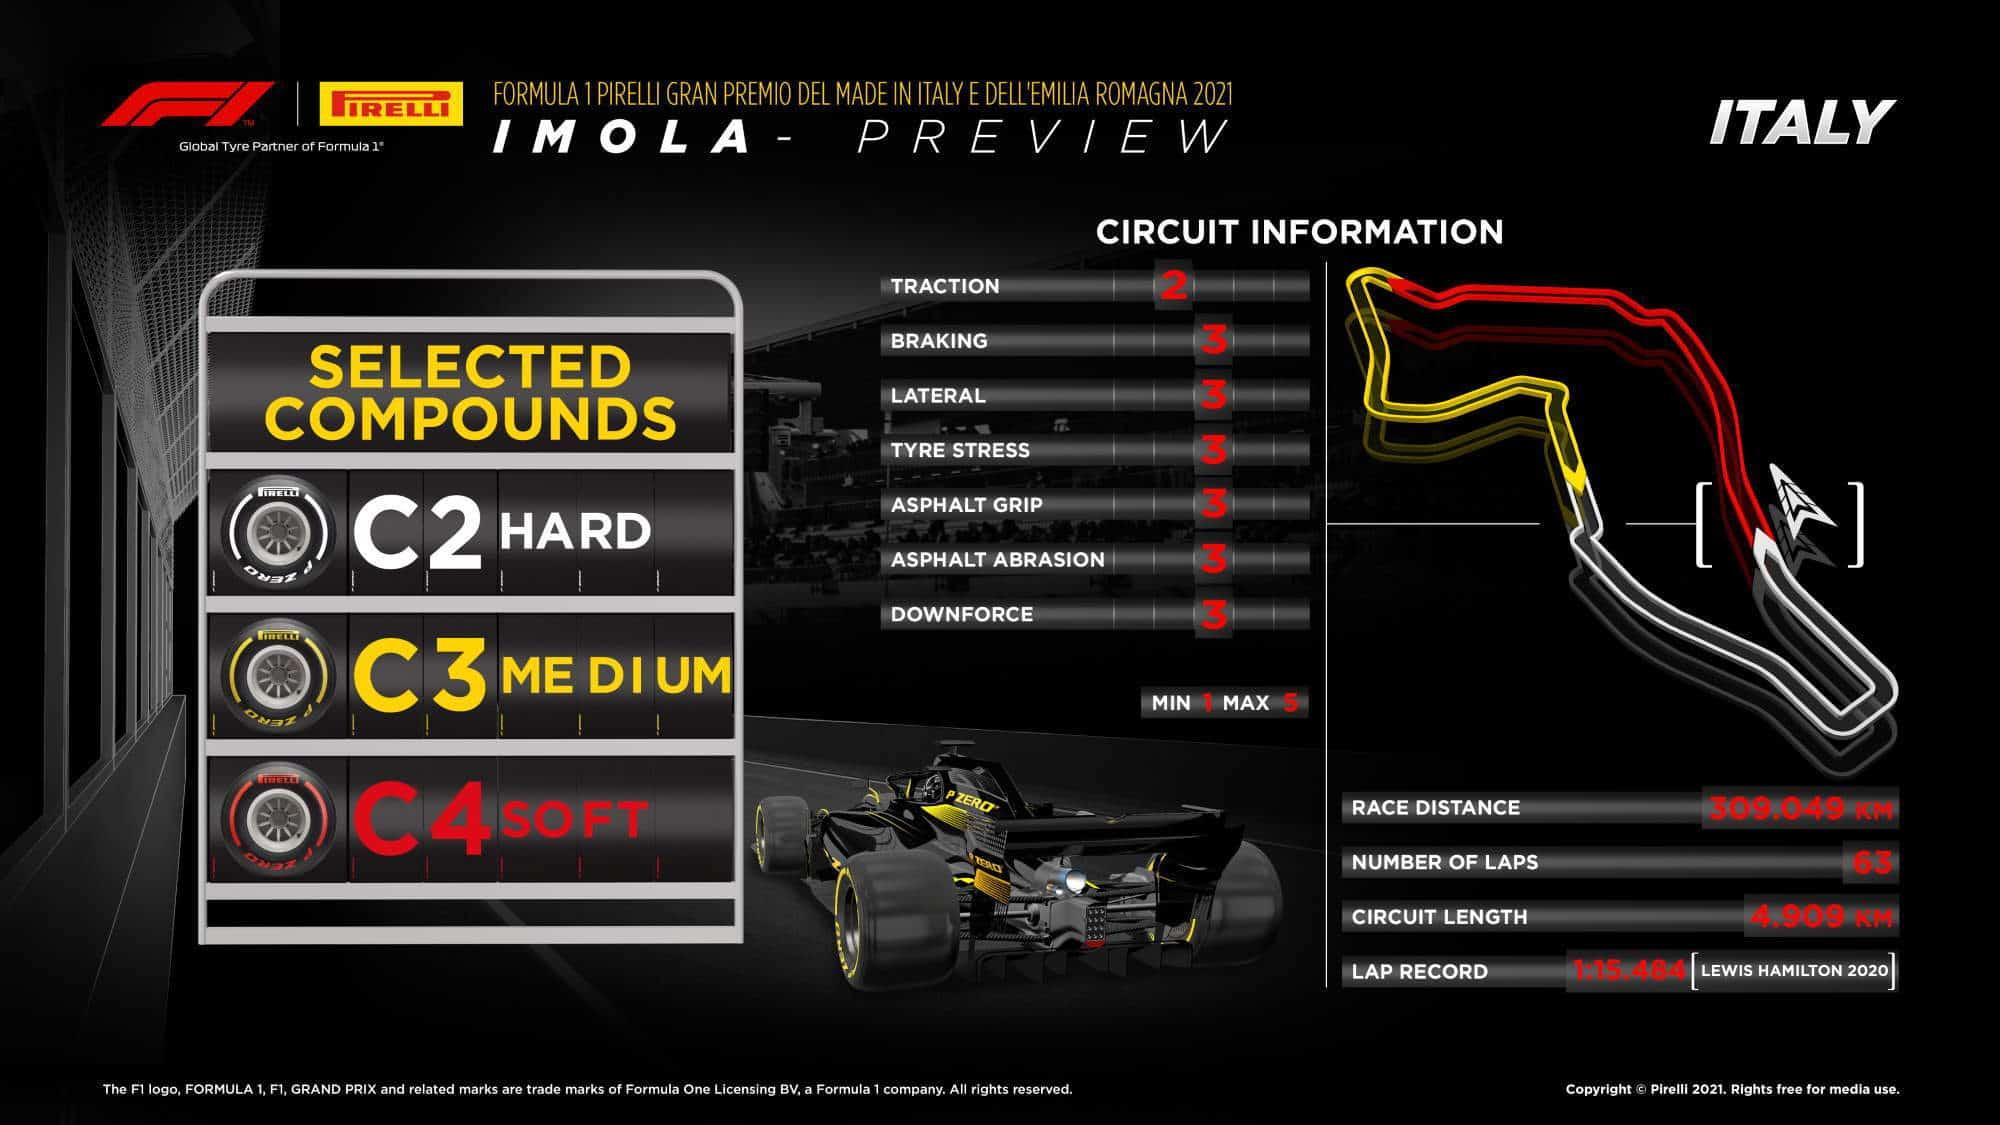 2021 Emilia Romagna GP Imola F1 circuit information Photo Pirelli Edited by MAXF1net